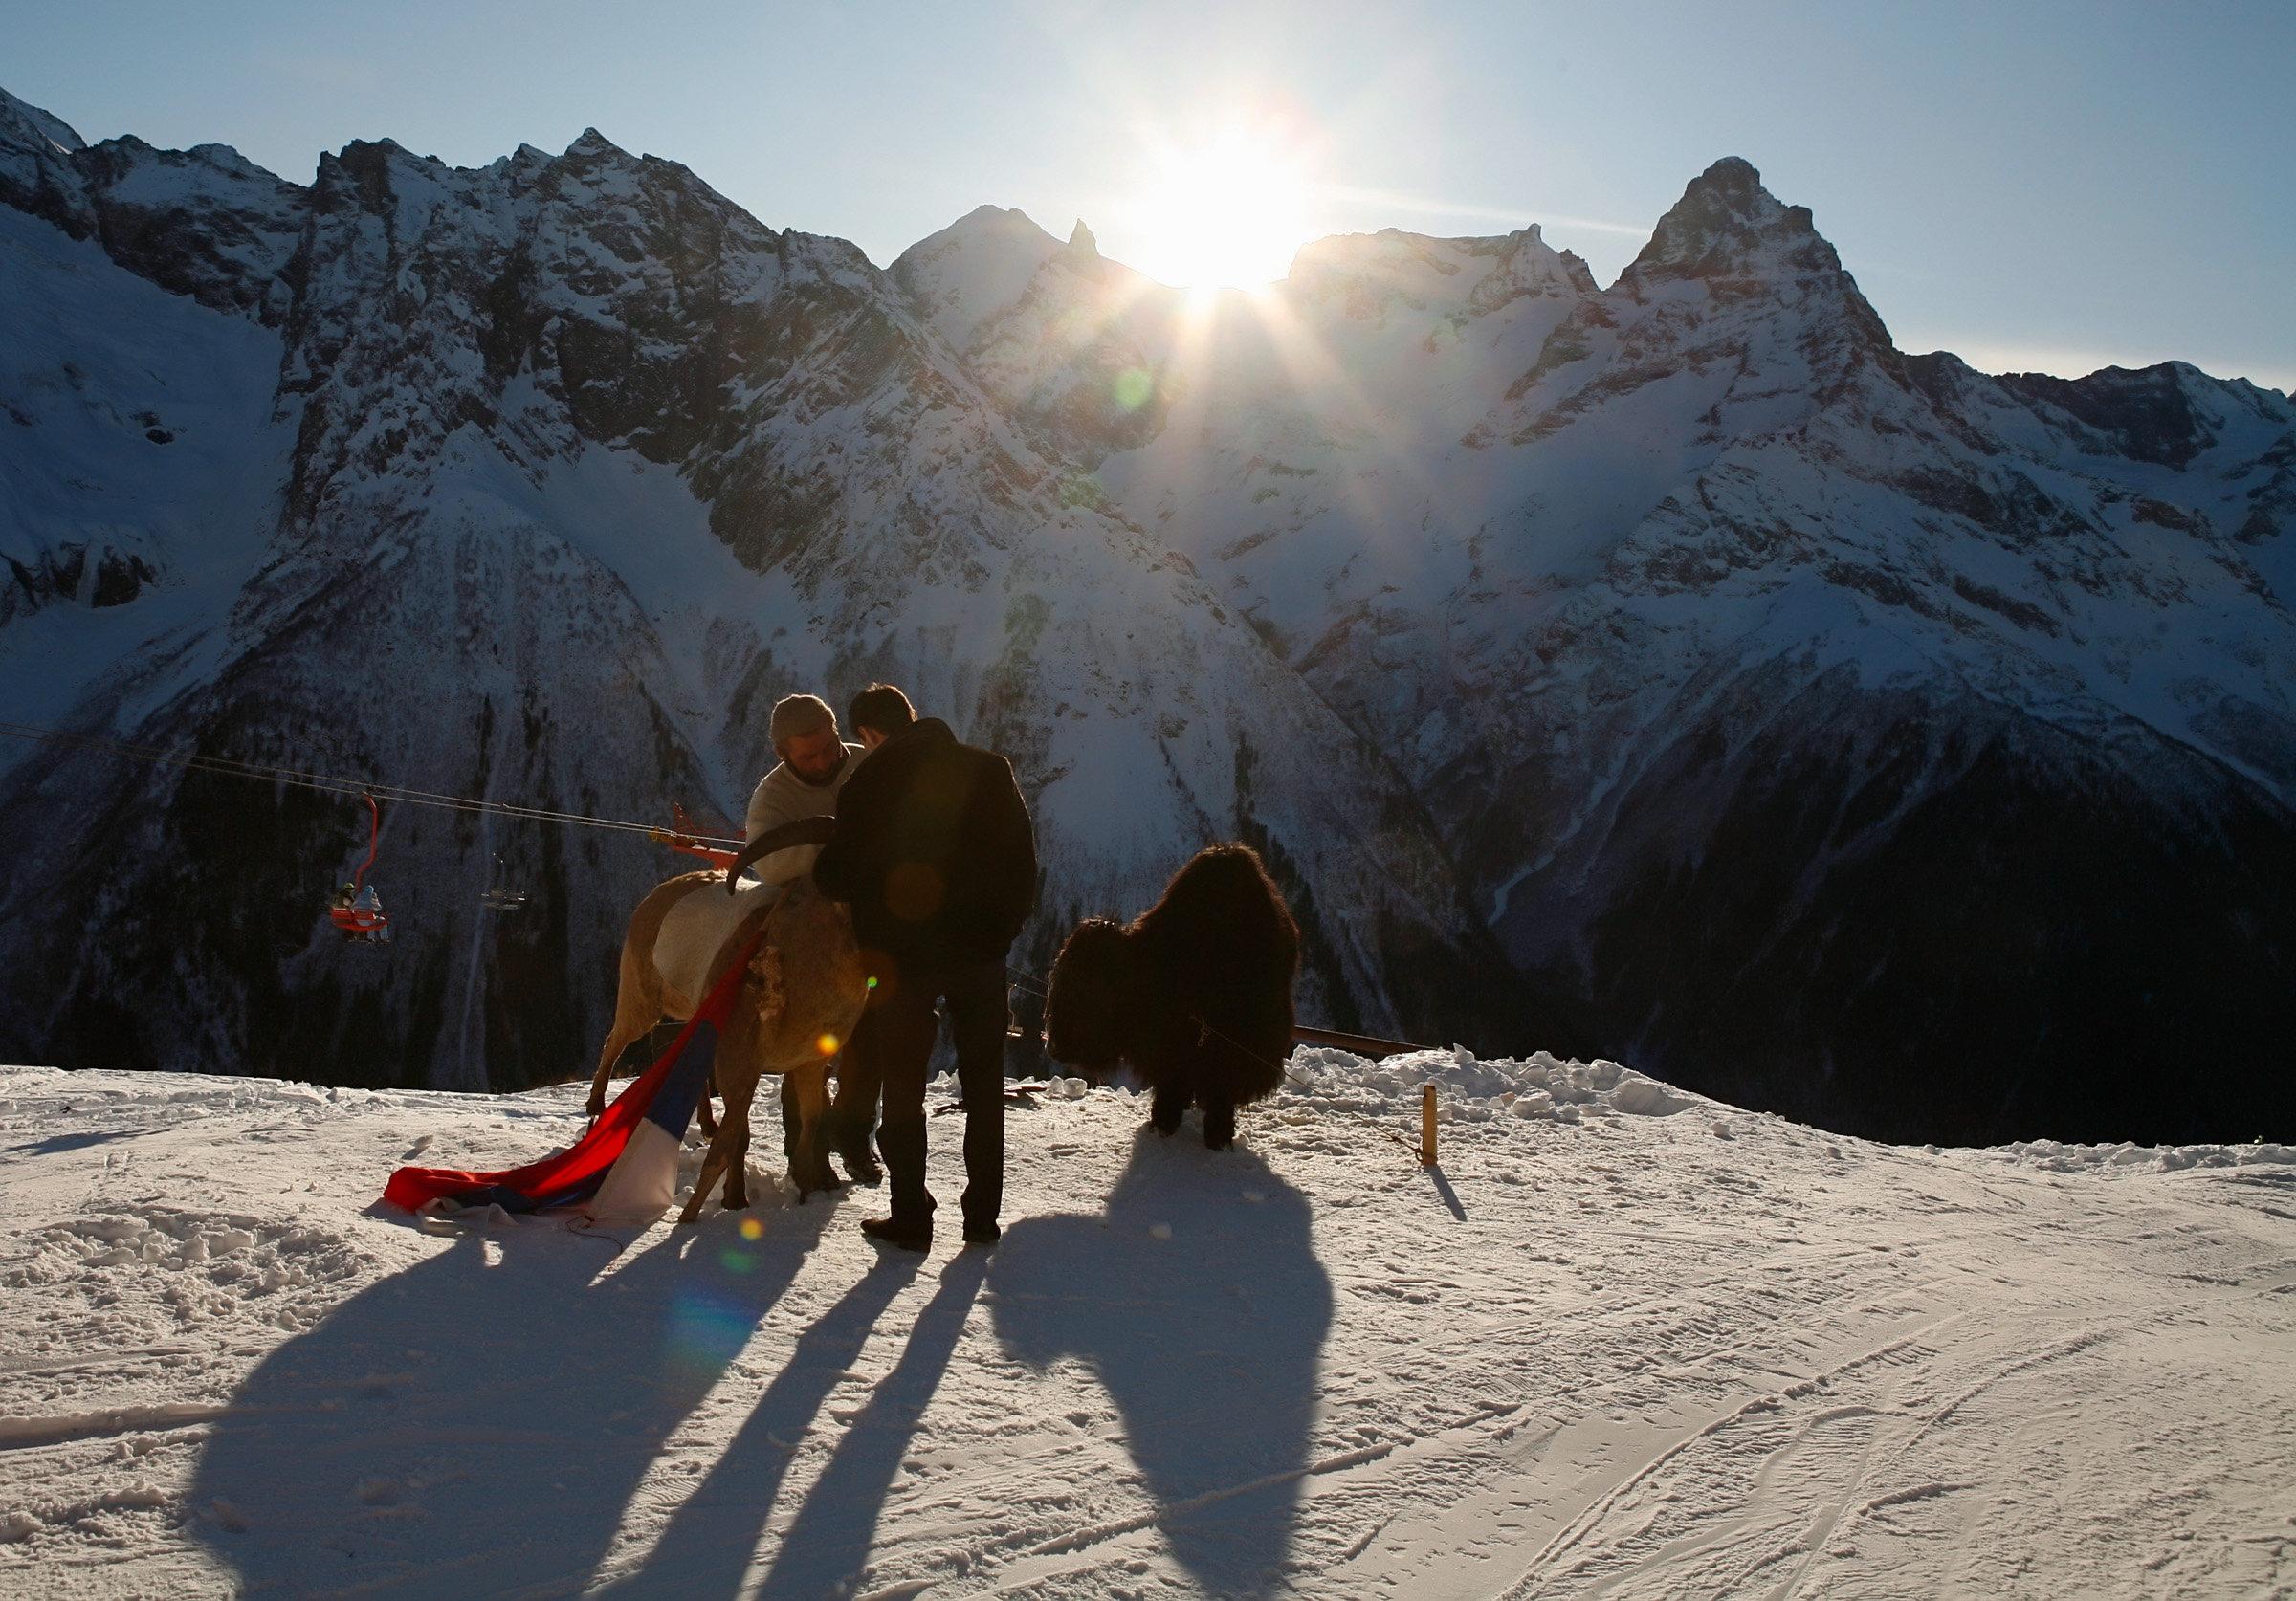 Holiday-makers at the ski resort of Dombai. (File)